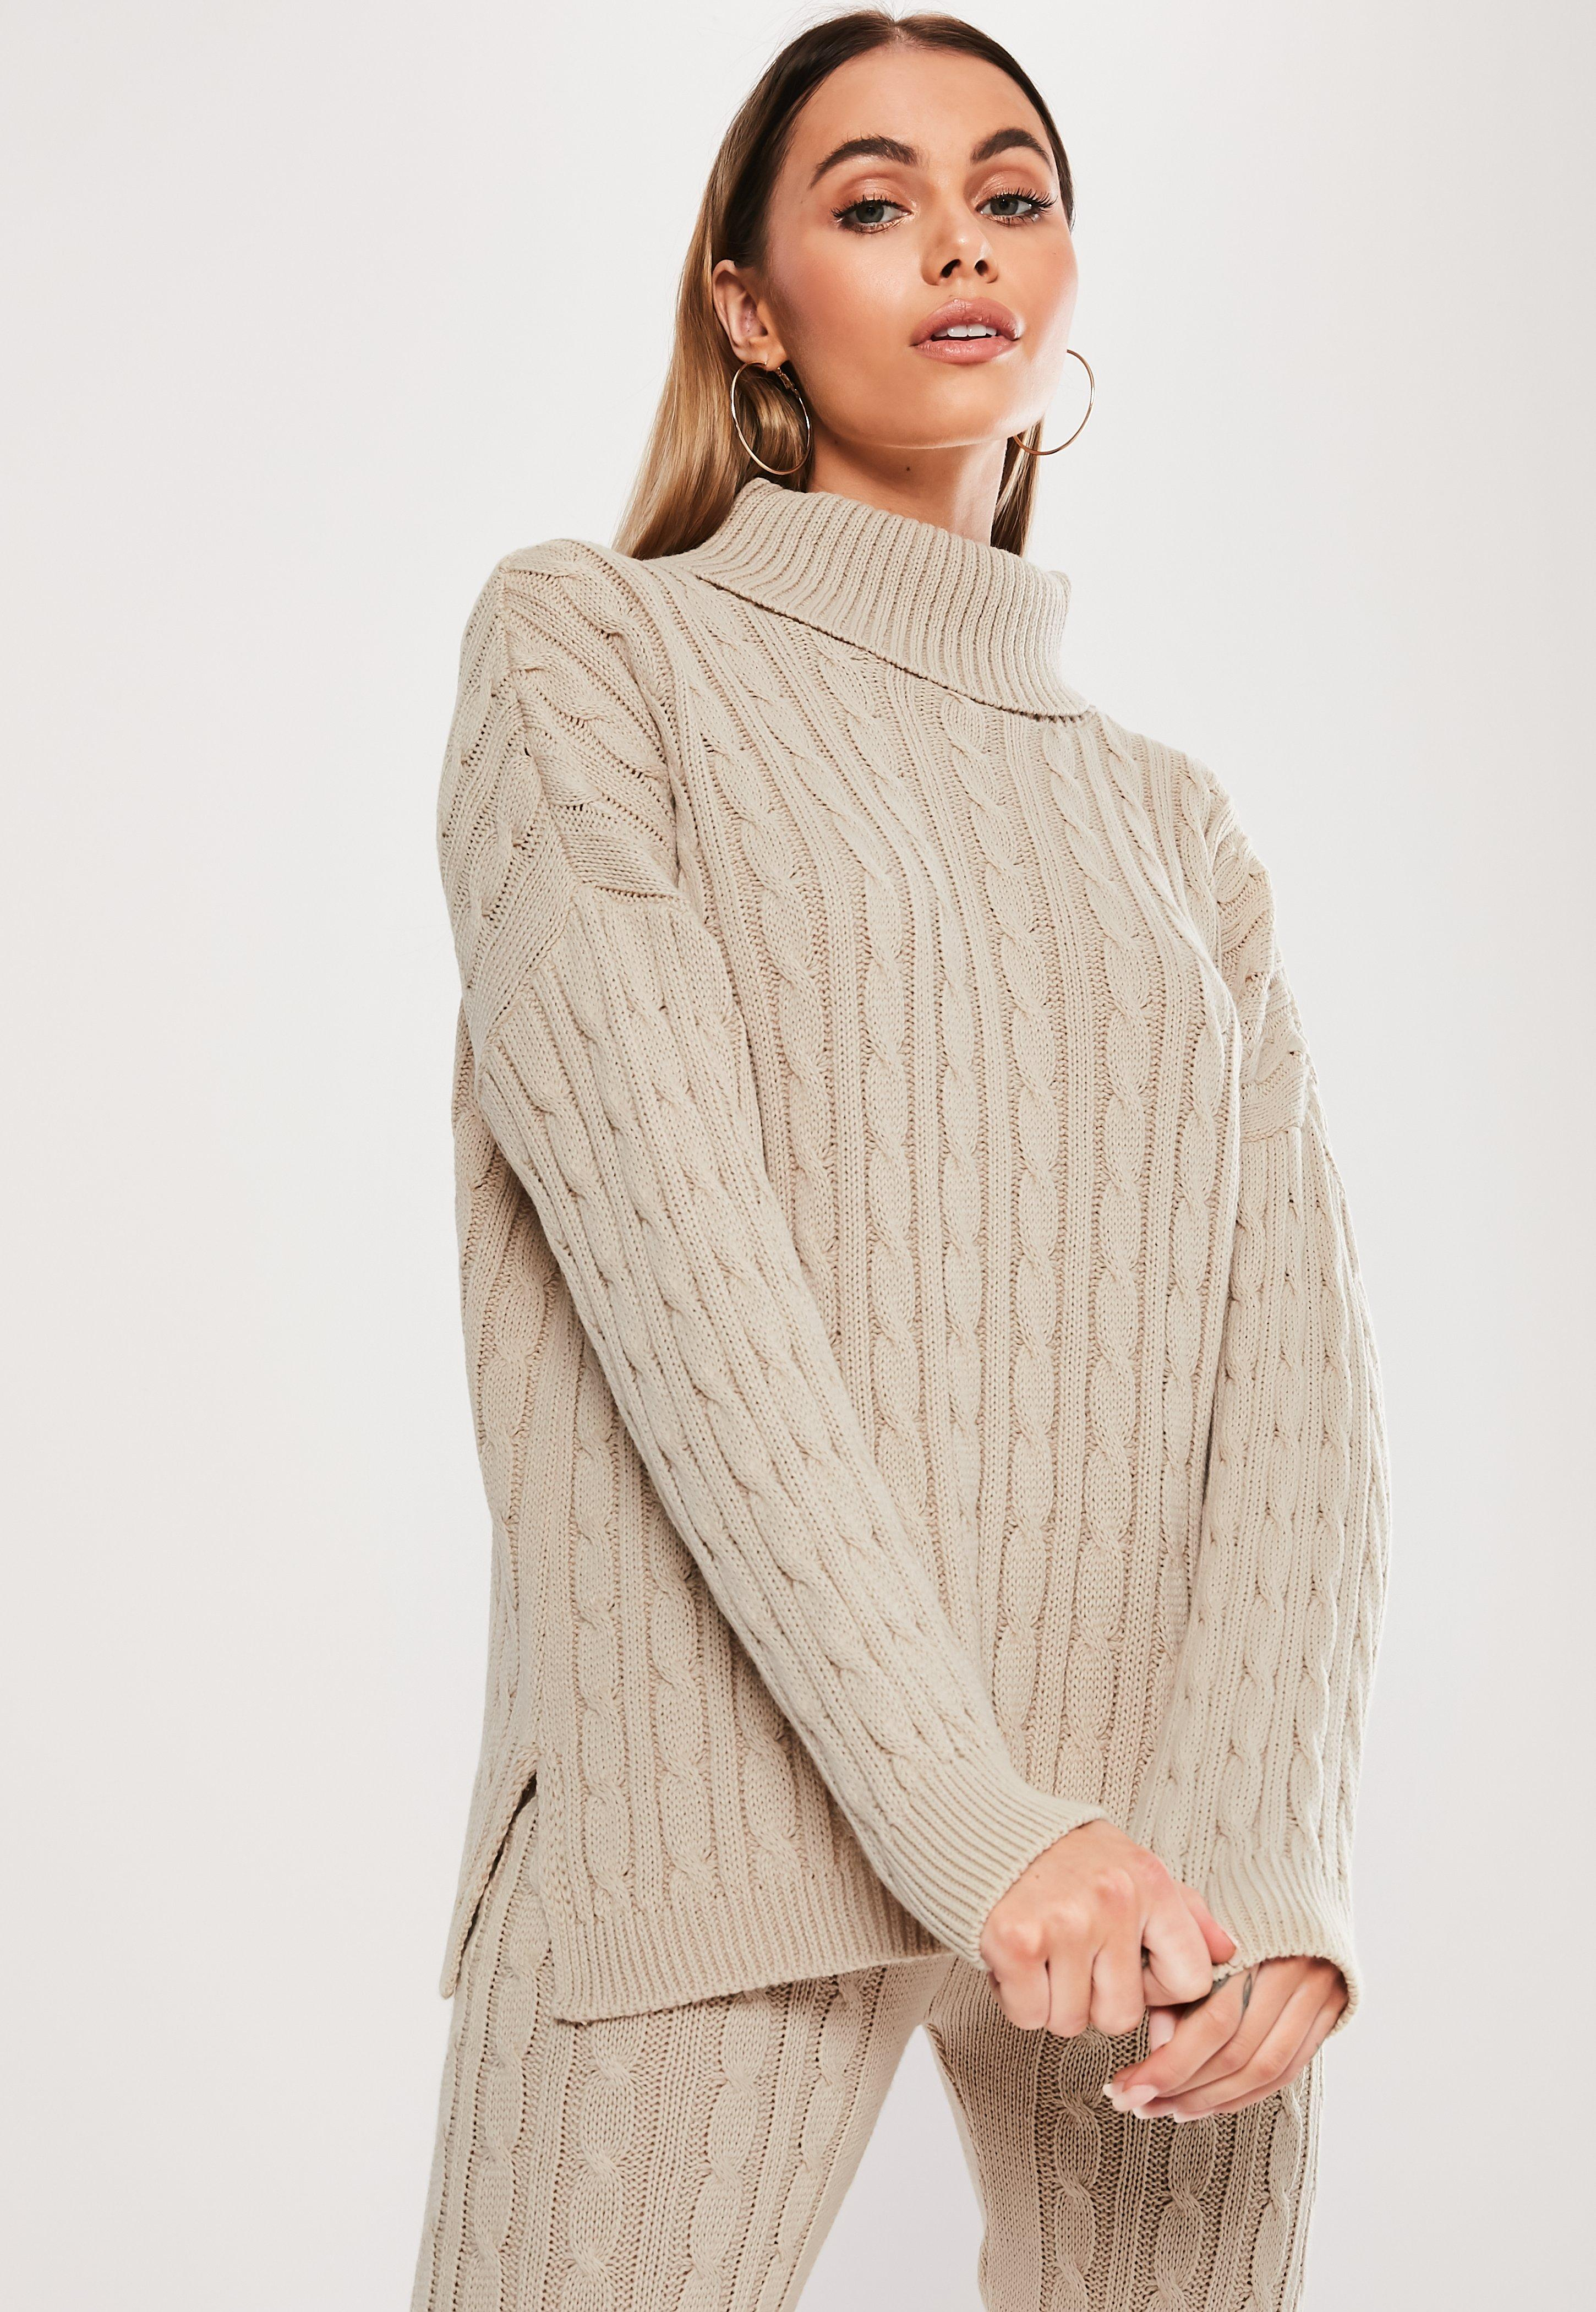 e10b1b15fe Women s Sweaters - Oversized   Knitted Sweaters